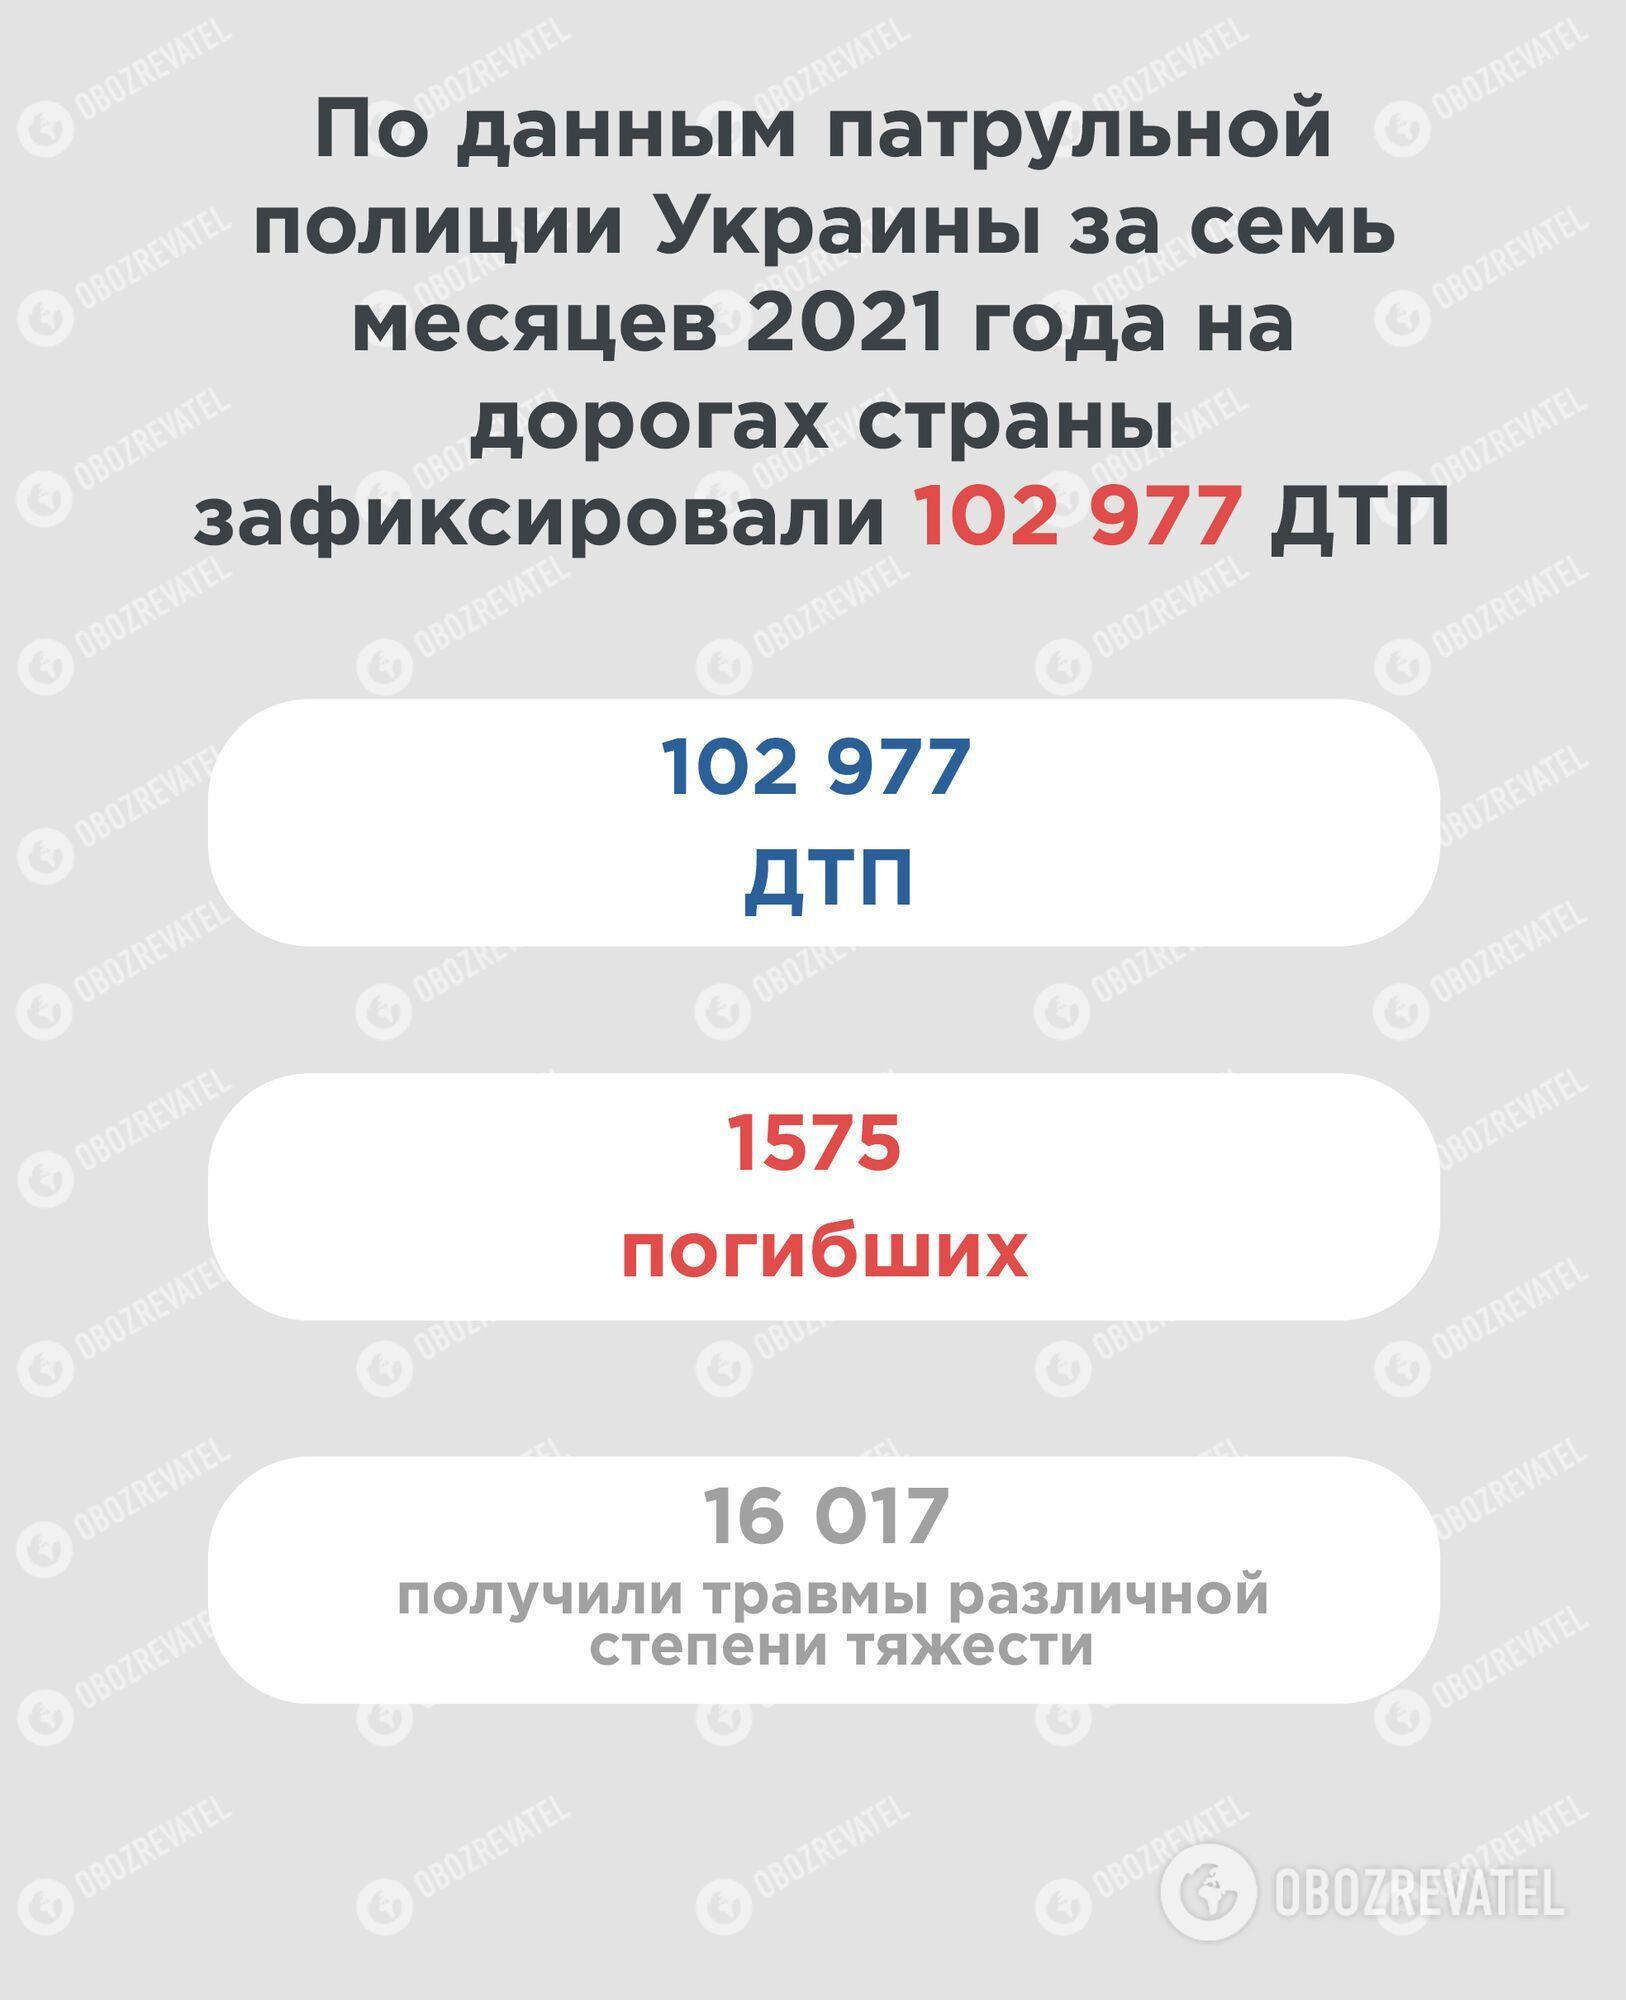 Статистика аварийности в Украине за 7 месяцев 2021 года